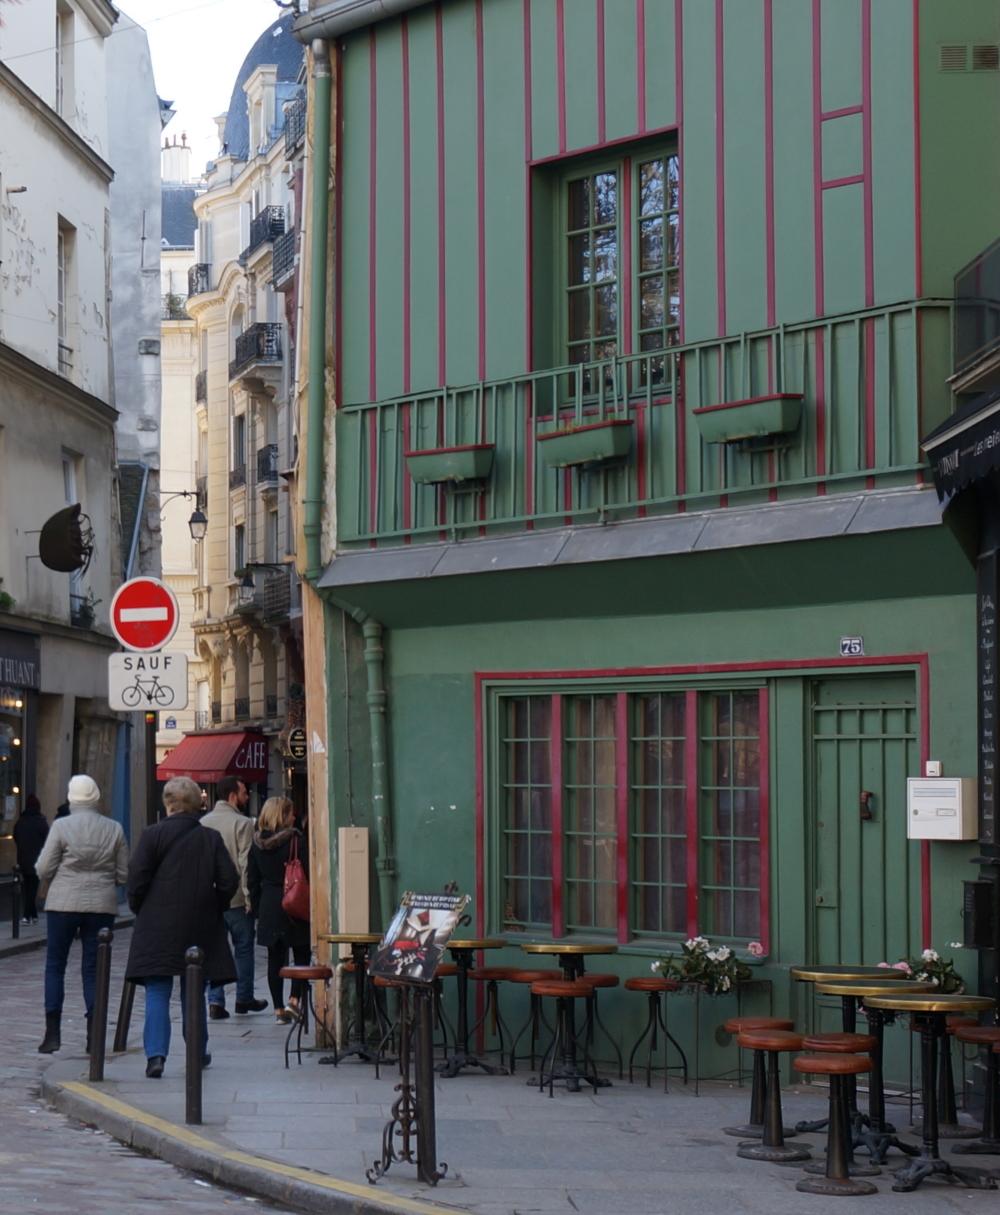 2018, ibidem.xyz ,Coin rue Galande,75, rue Galande,Paris,France